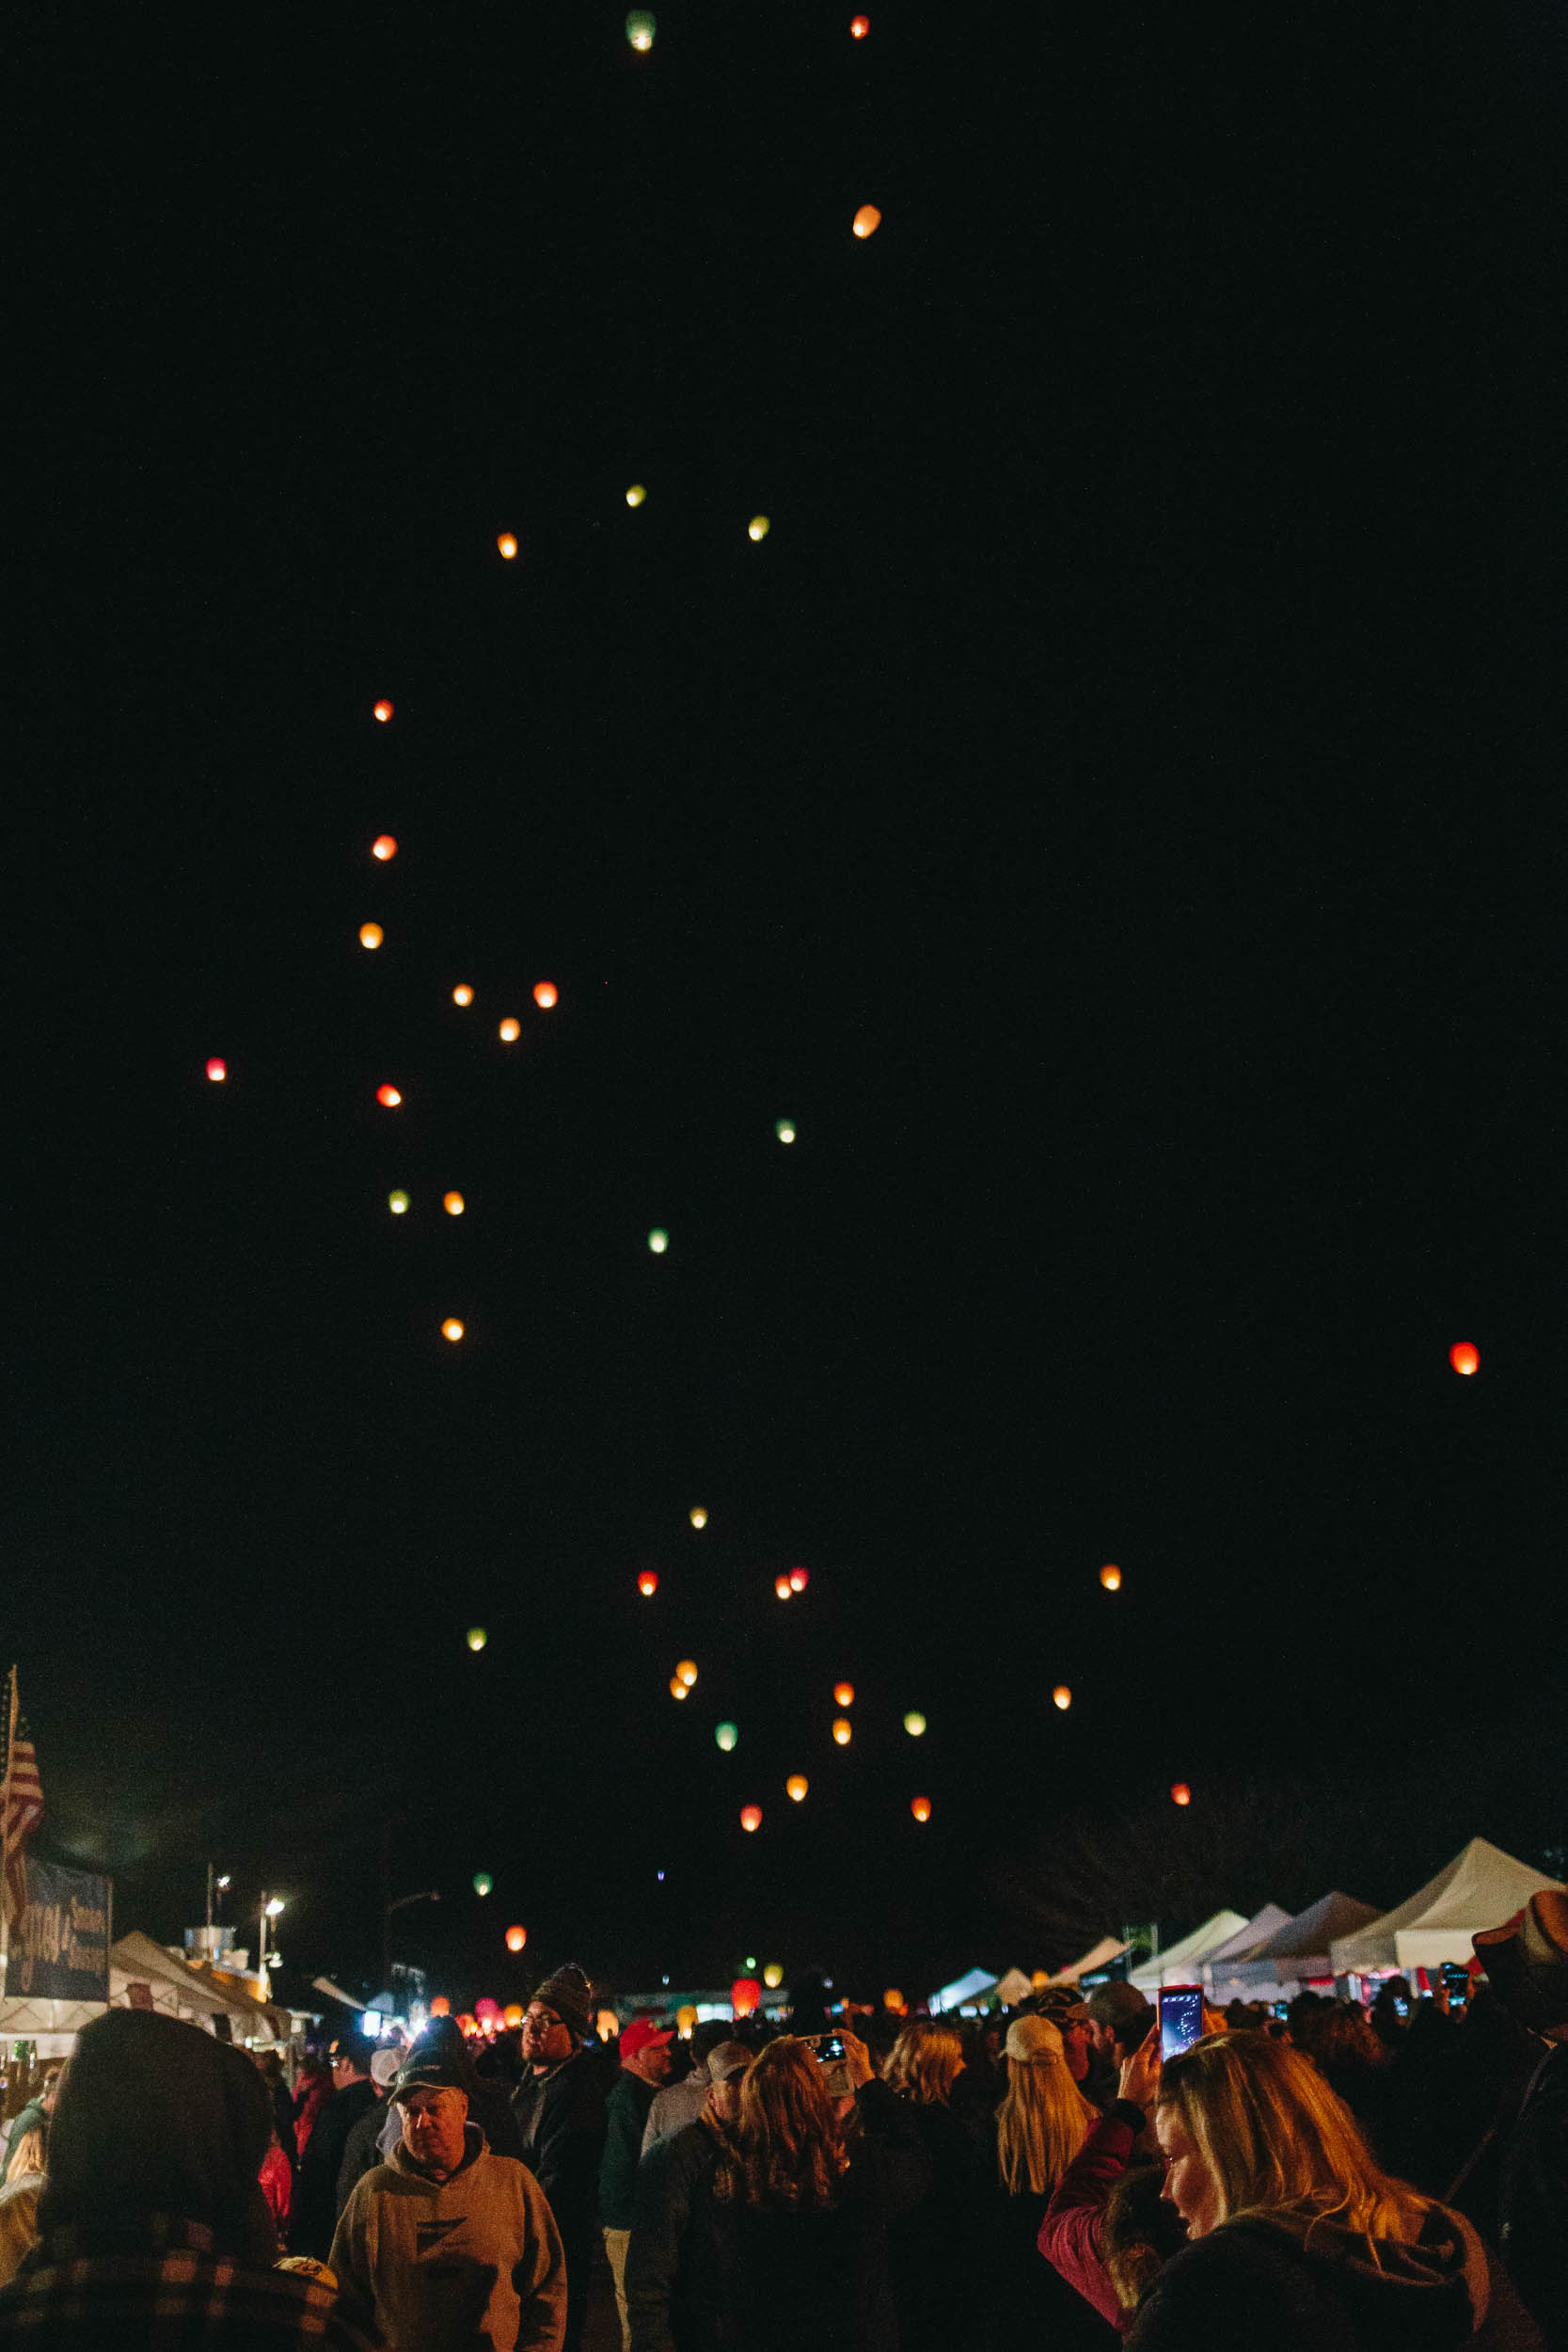 Kyle-Sheppard-Kanab-Balloon-Festival-53.jpg